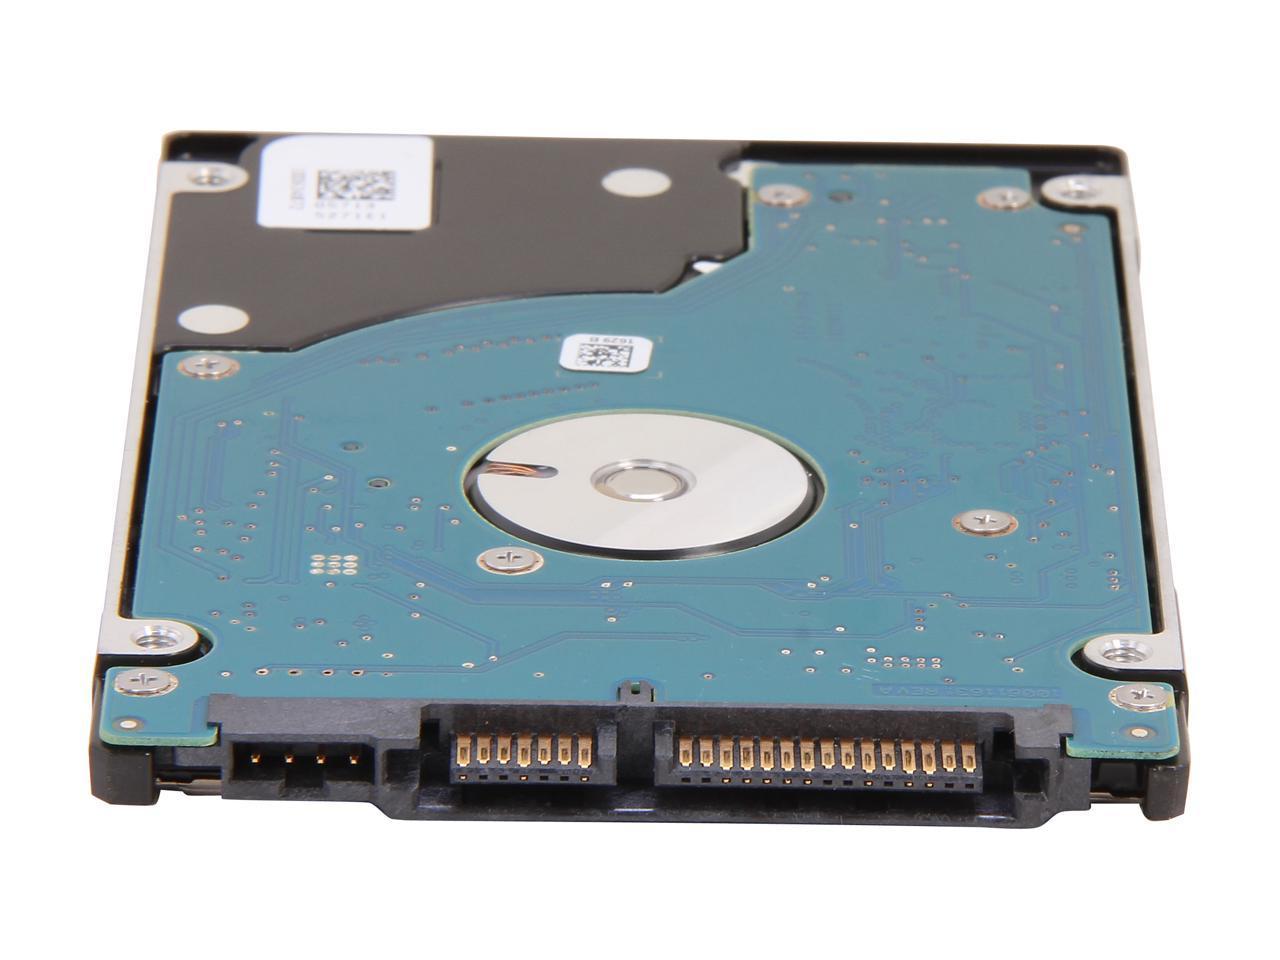 Seagate Momentus Thin - 320GB Harddisk - 320 GB - 2.5